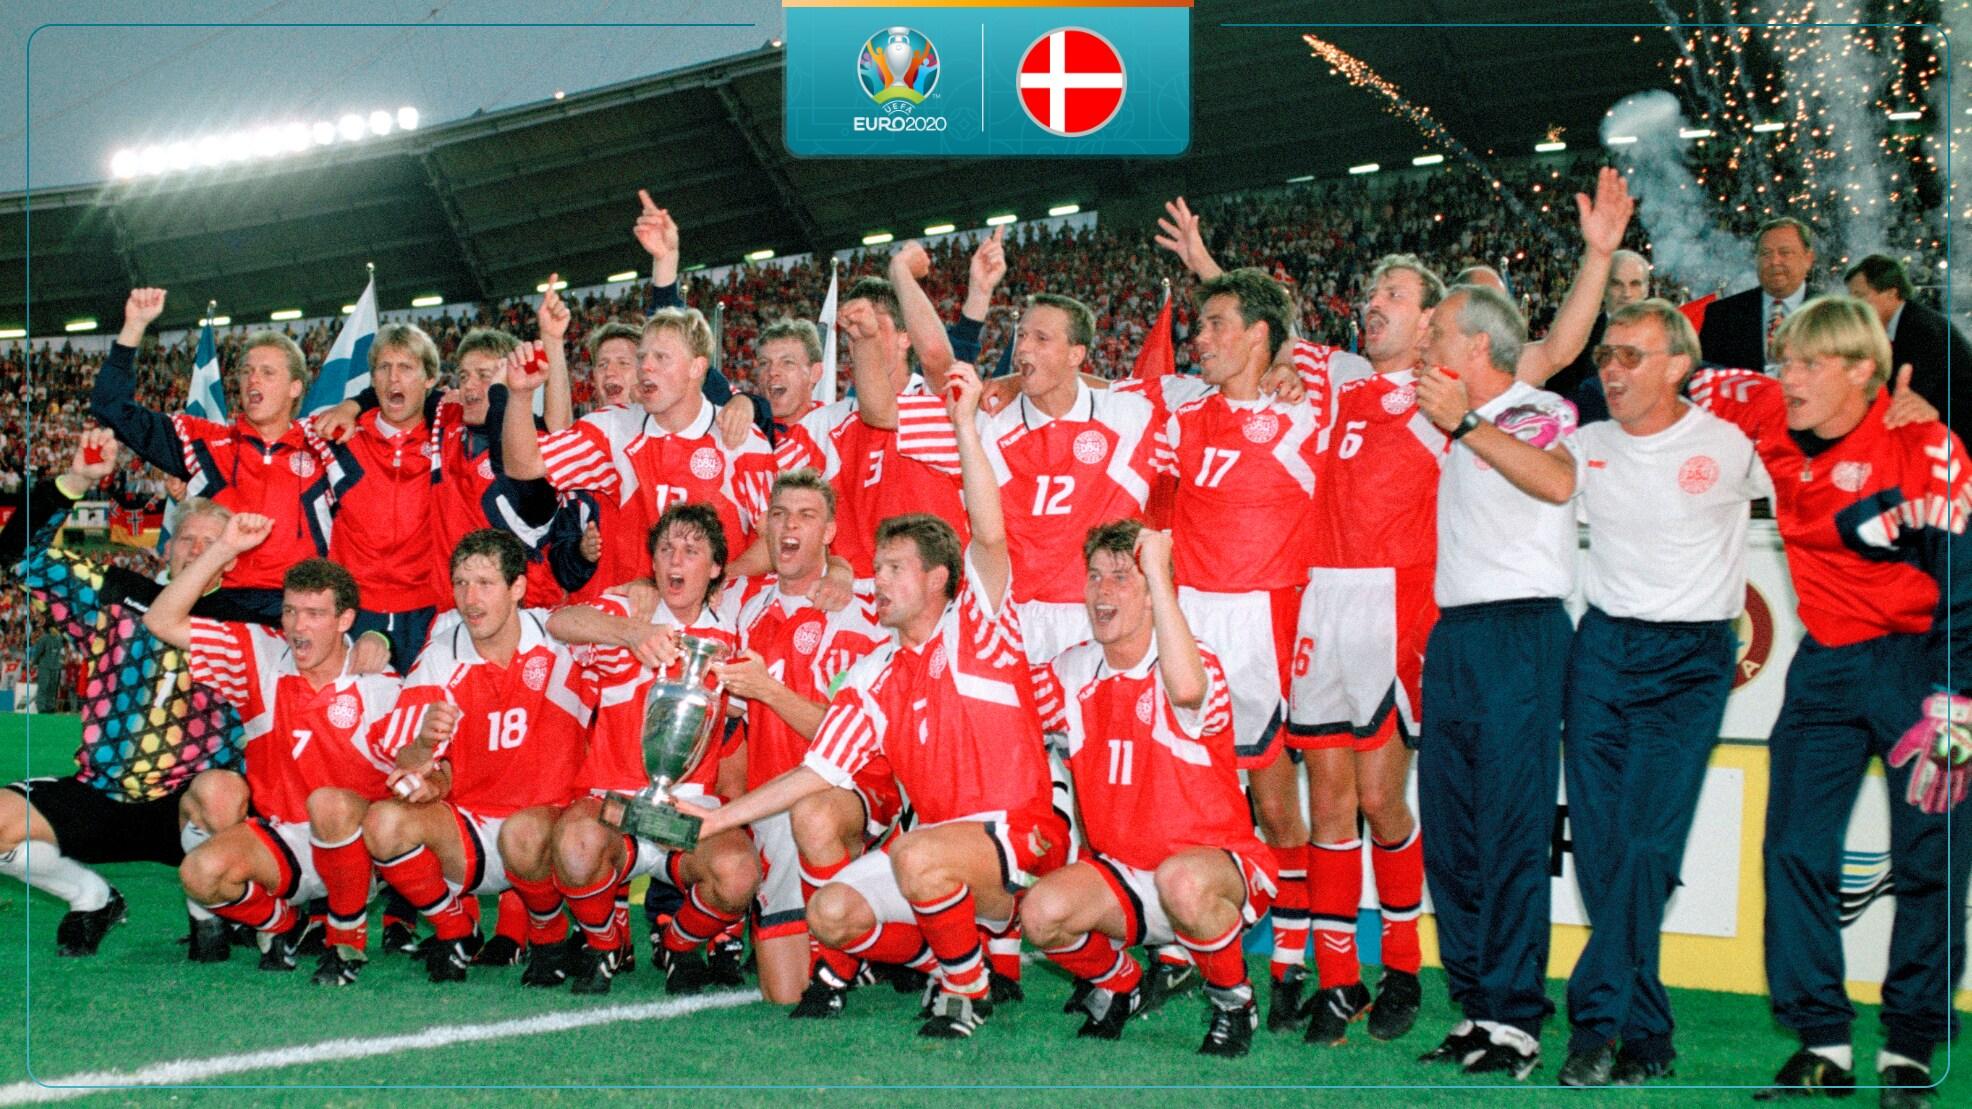 EURO 2020 contenders: Denmark